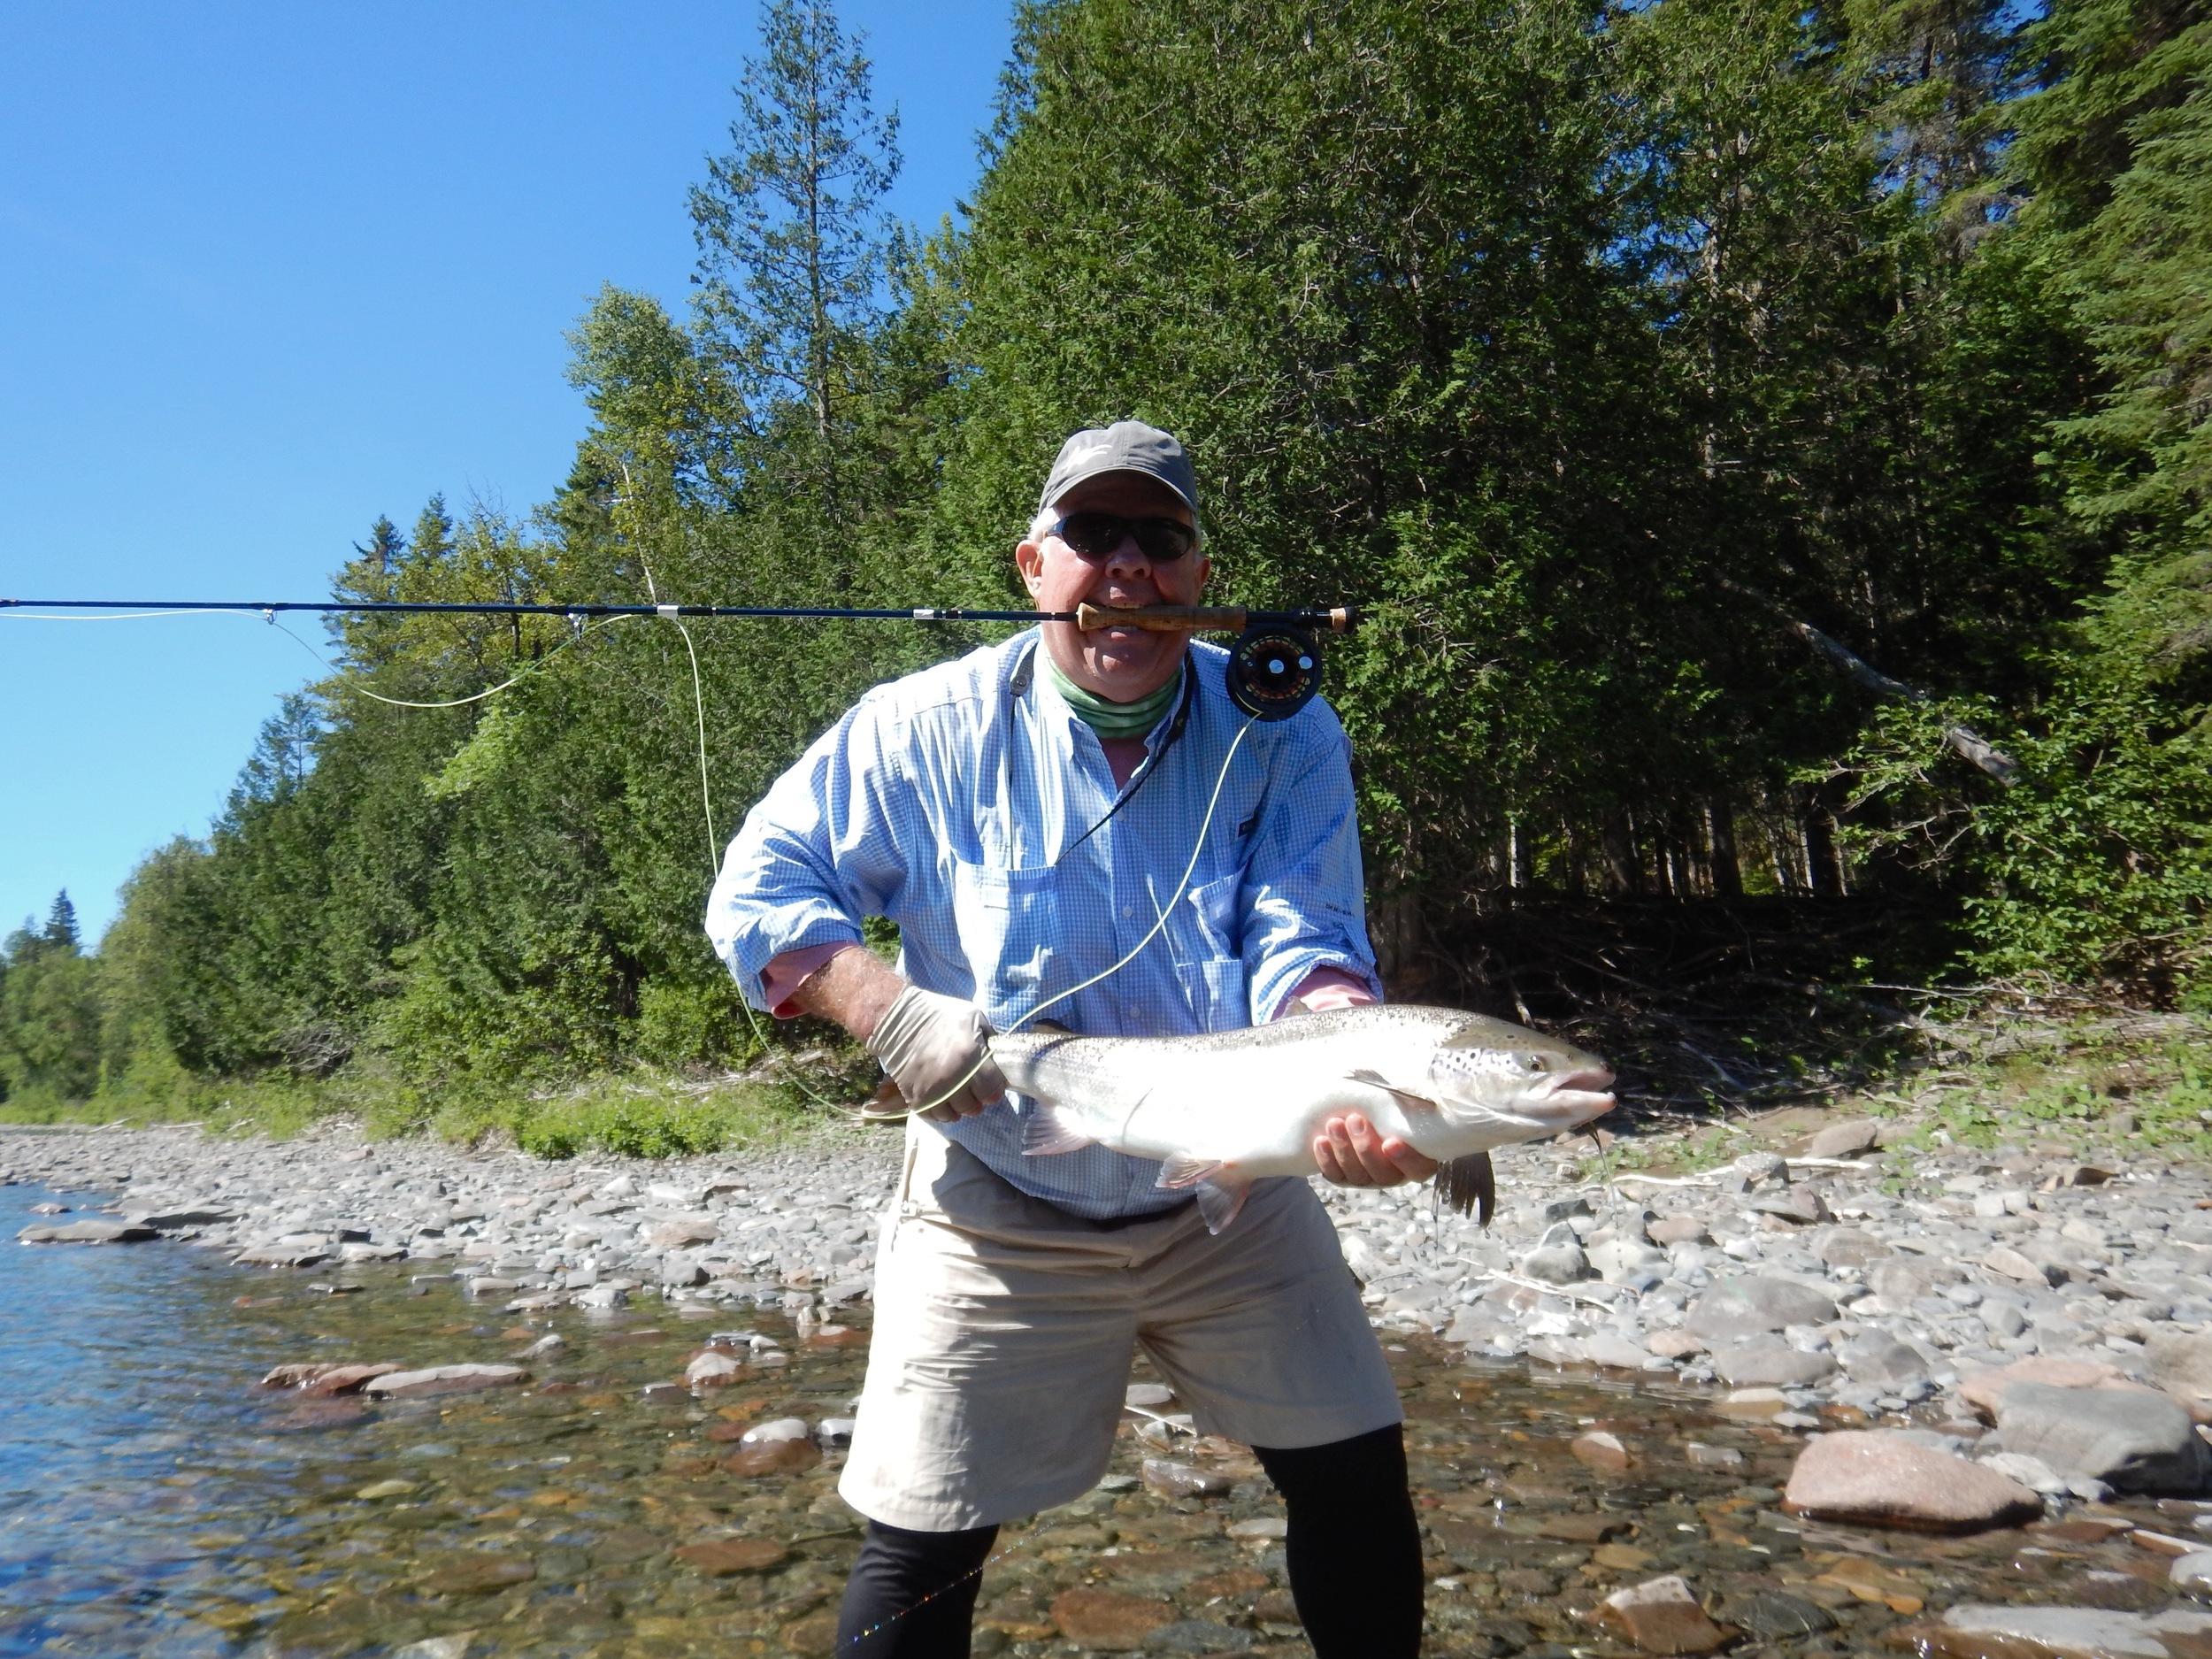 Bill Blodget with a sliver Bonaventure salmon, congratulations Bill.